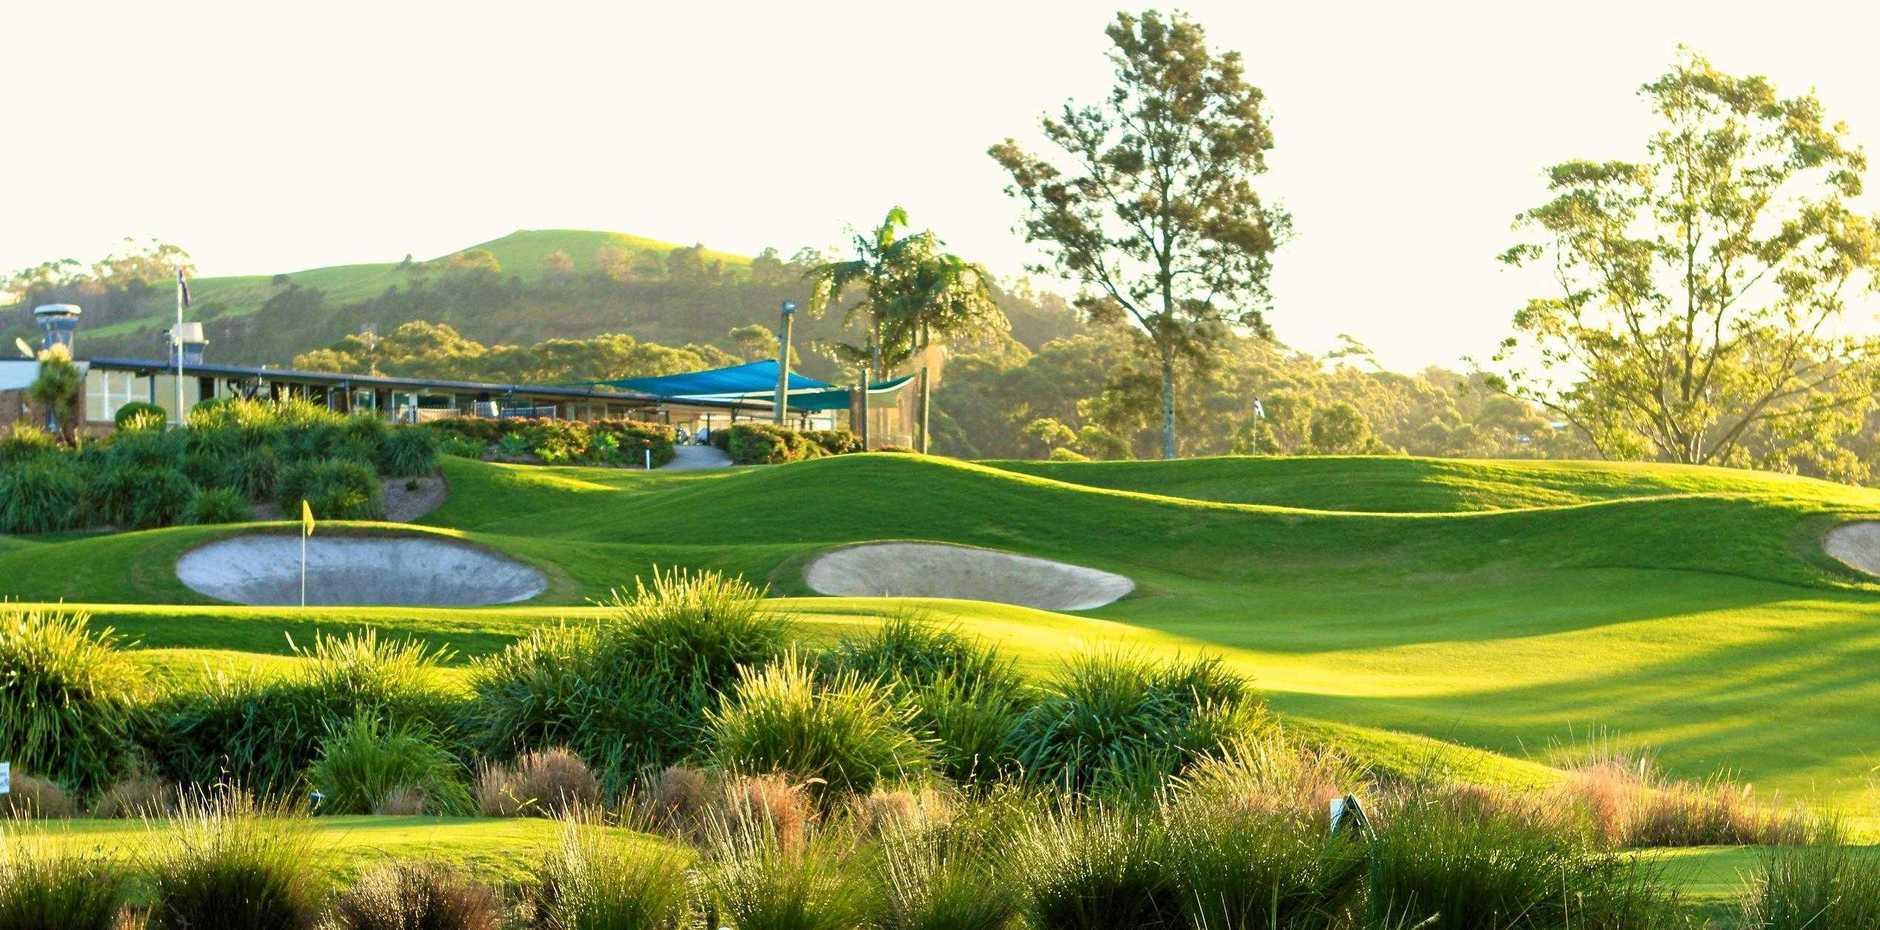 BEAUTIFUL BYRON: Byron Bay Golf Club will host the Byron Central Hospital Auxiliary's annual Charity Golf Day on Sunday, September 29.